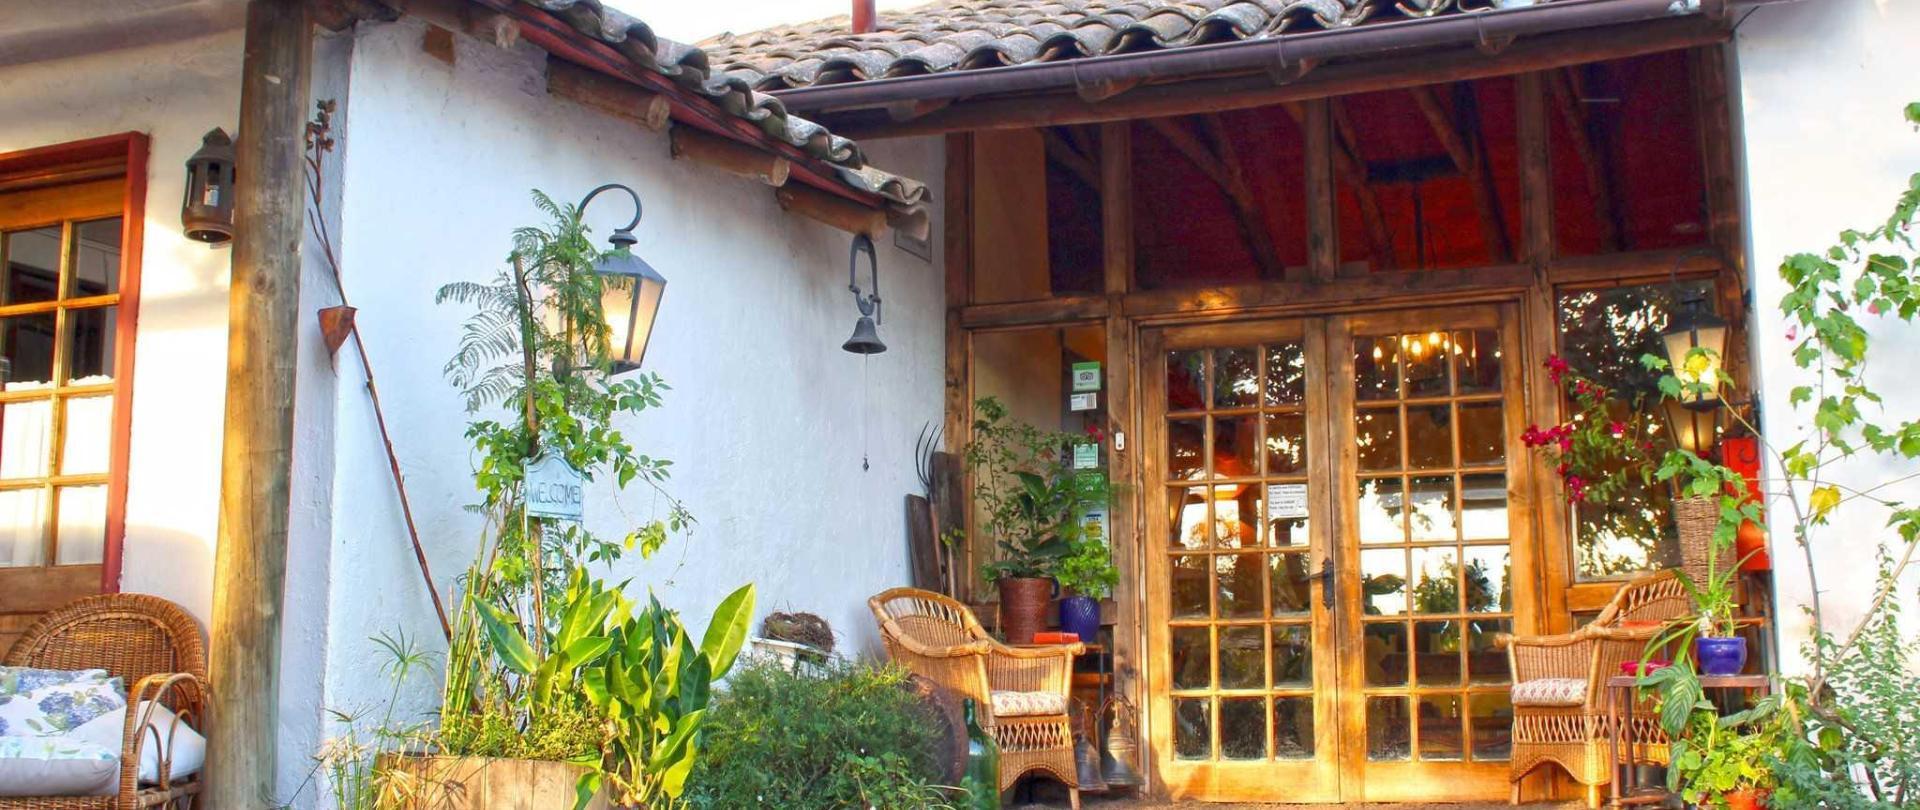 hotel-vendimia-parador-santa-cruz-valle-de-colchagua-1.jpg